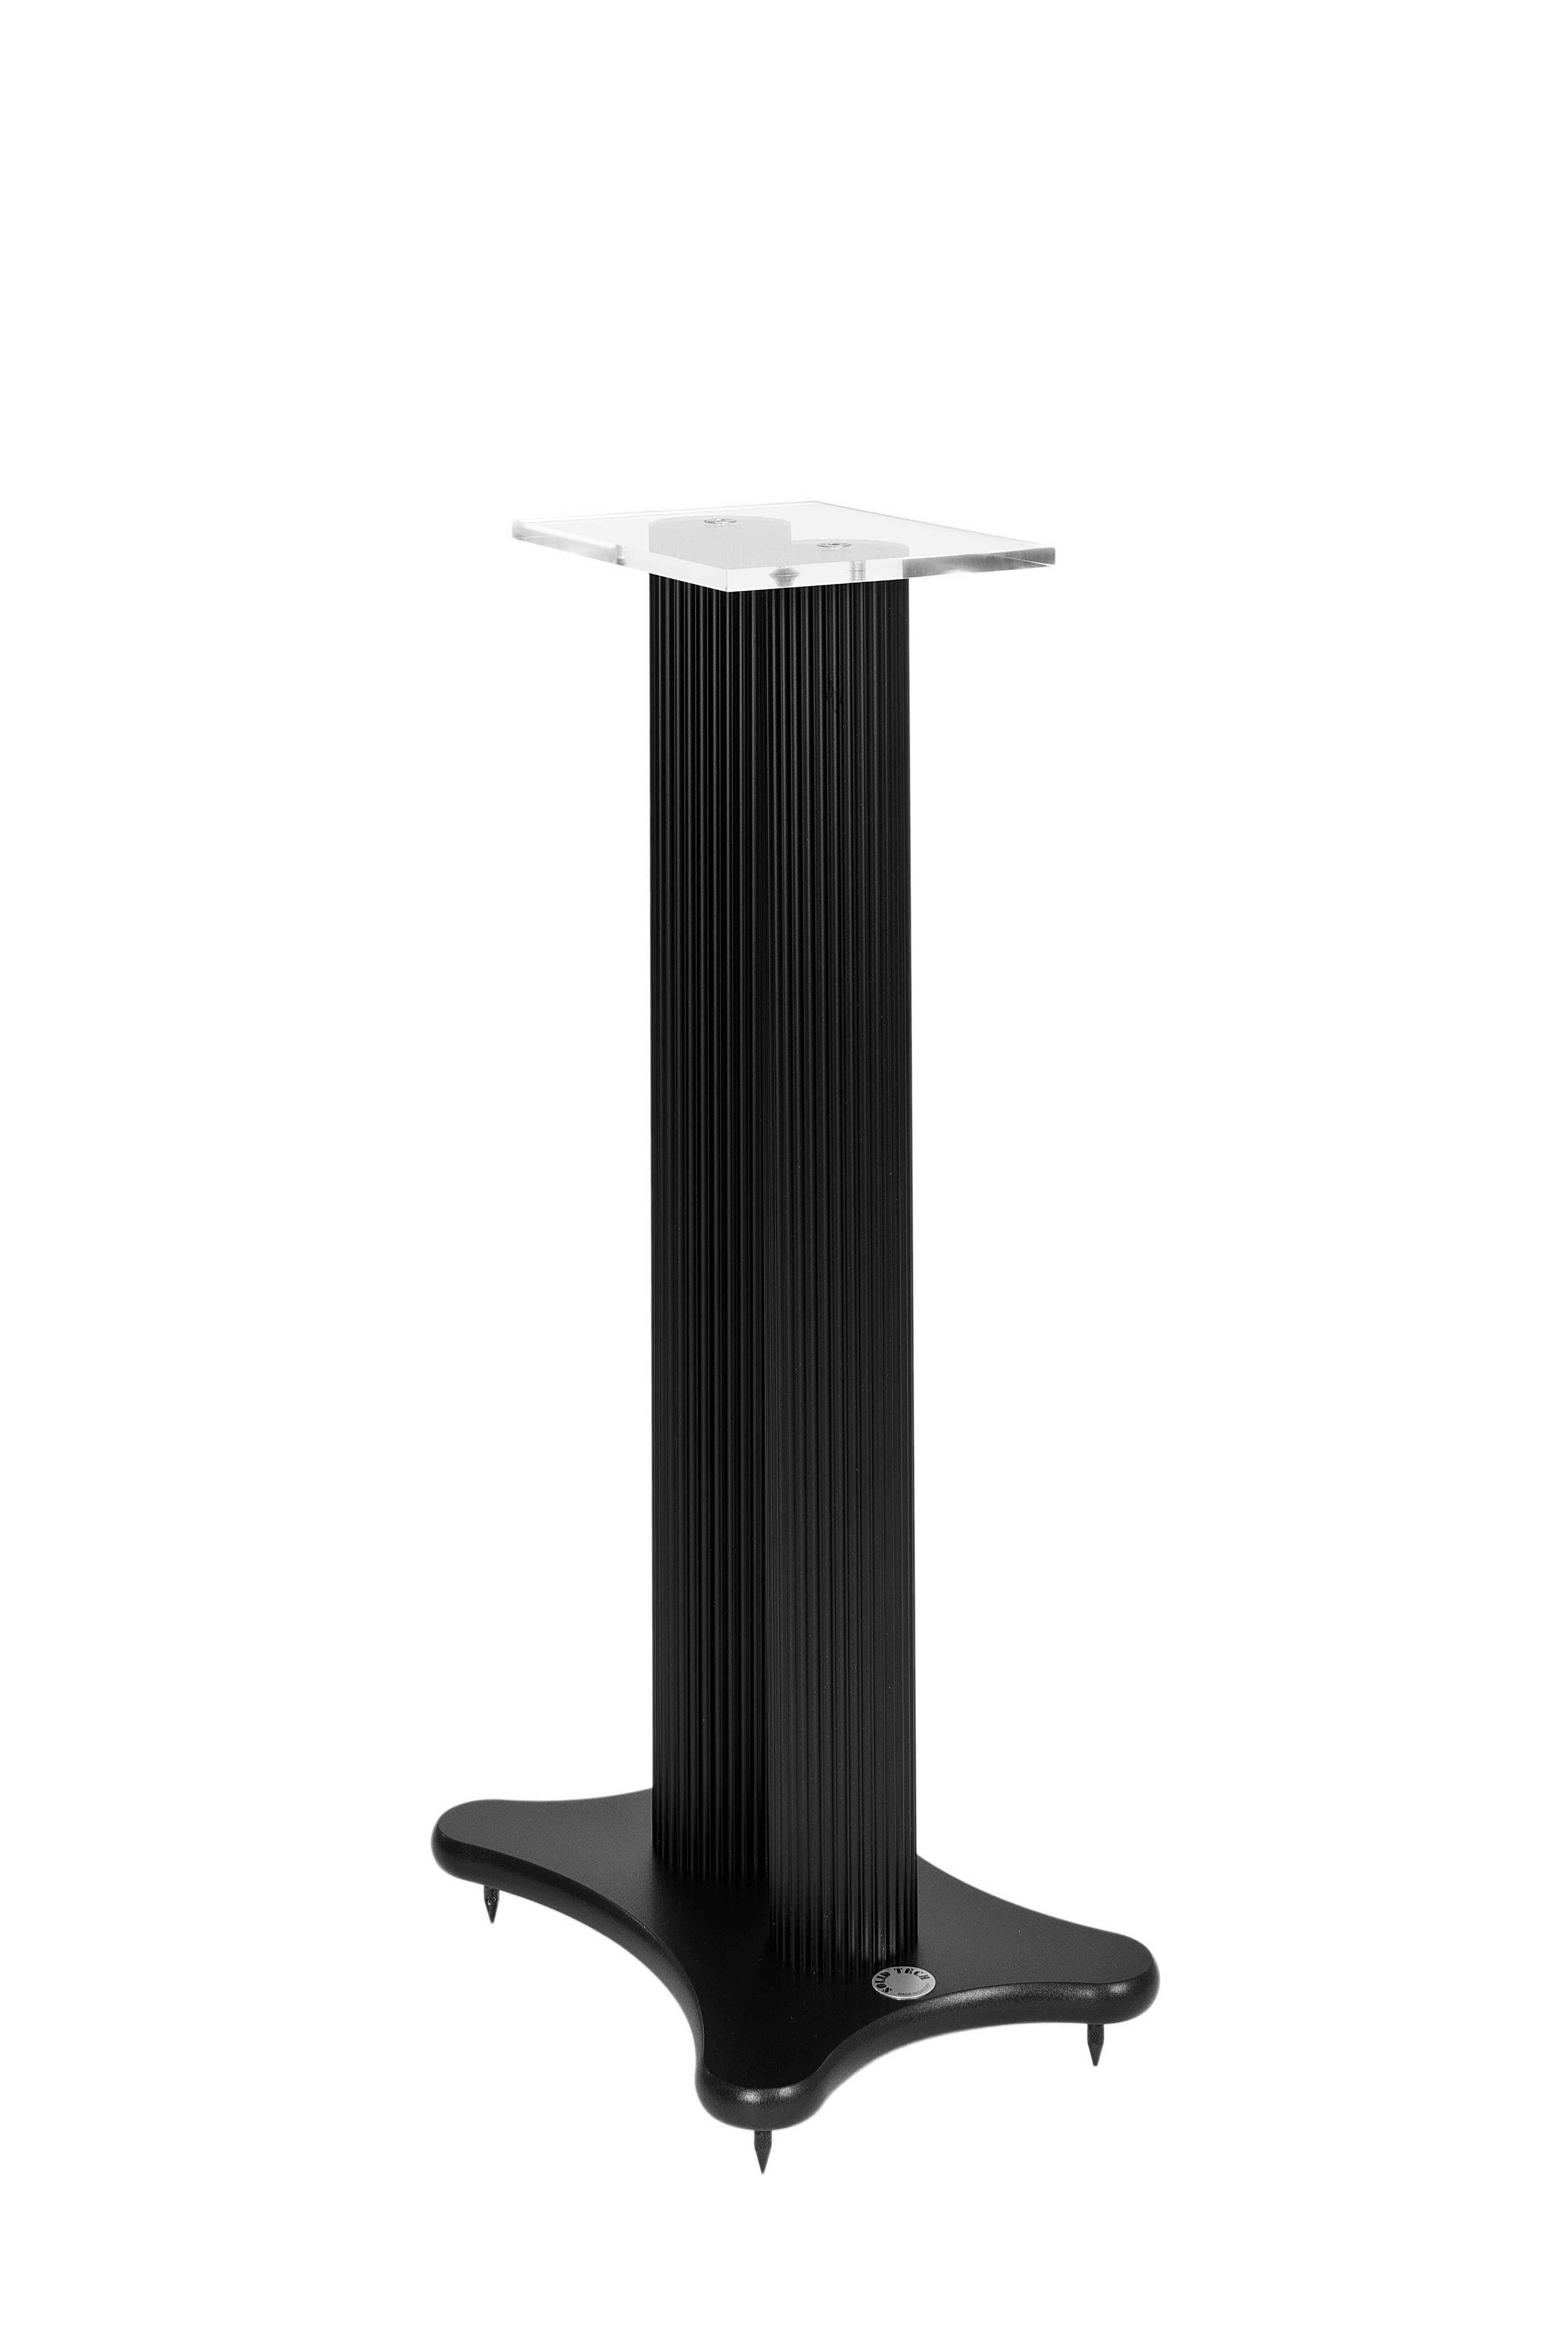 Speaker stand black foot and black pillars Image